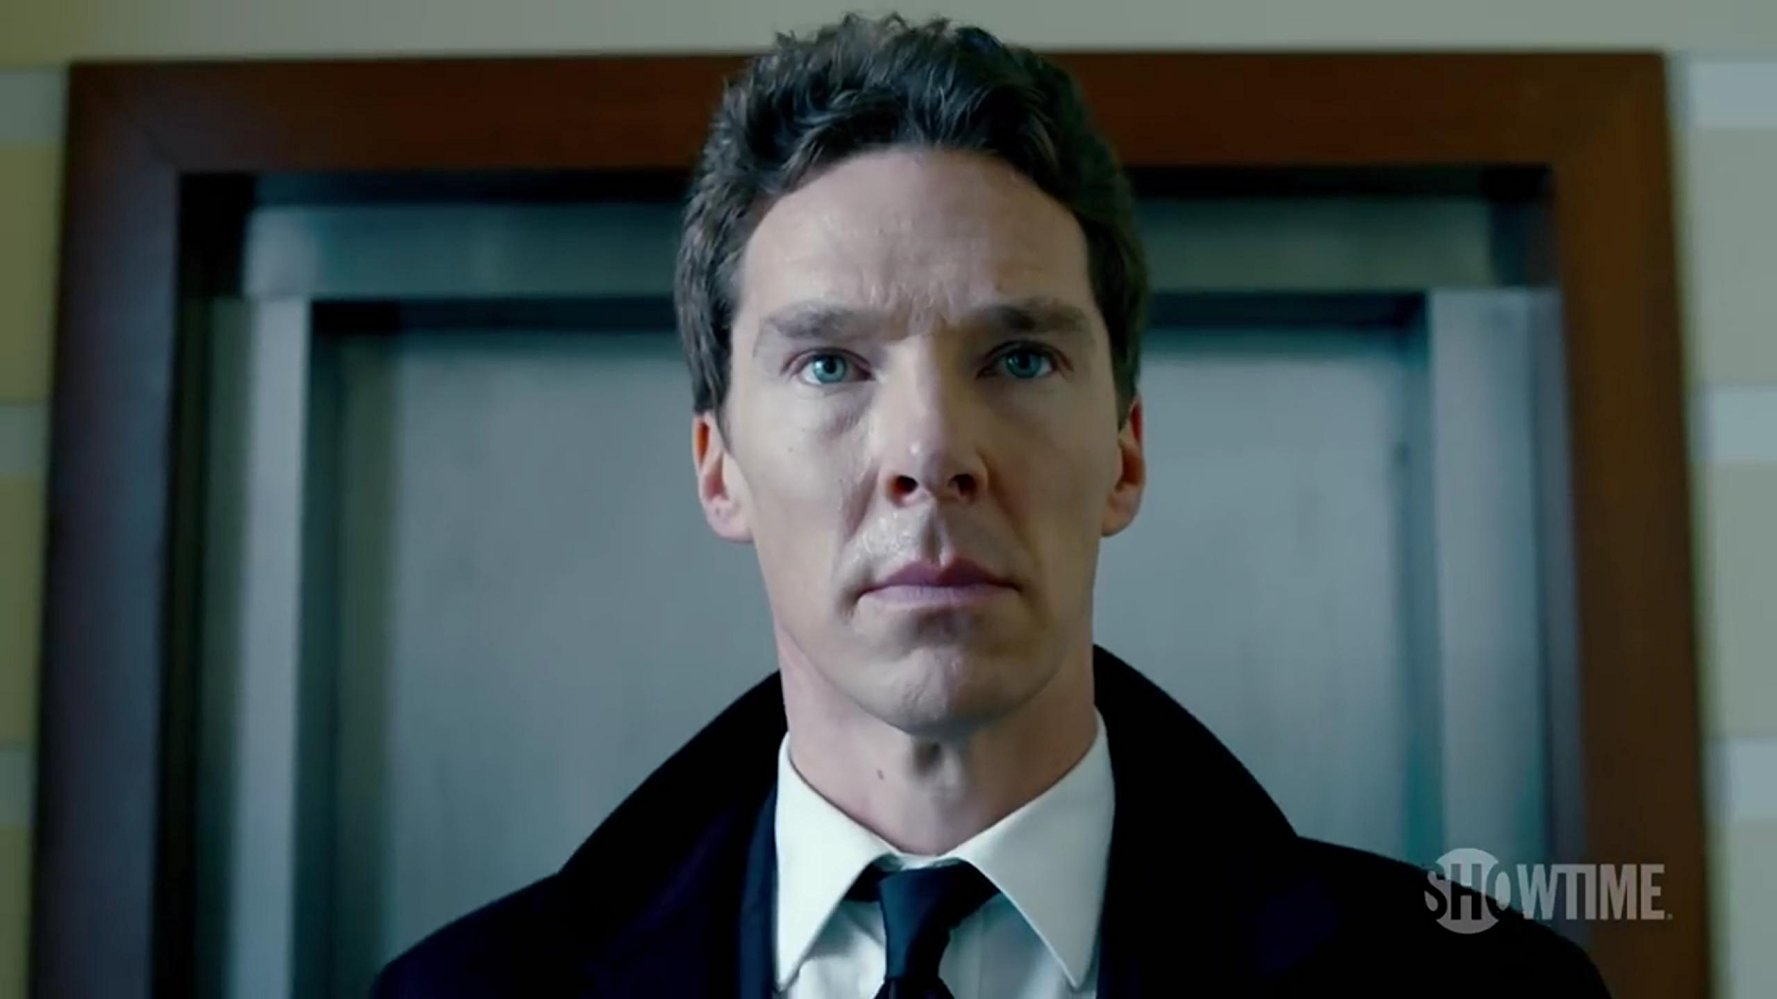 Patrick Melrose: un primo piano di Benedict Cumberbatch